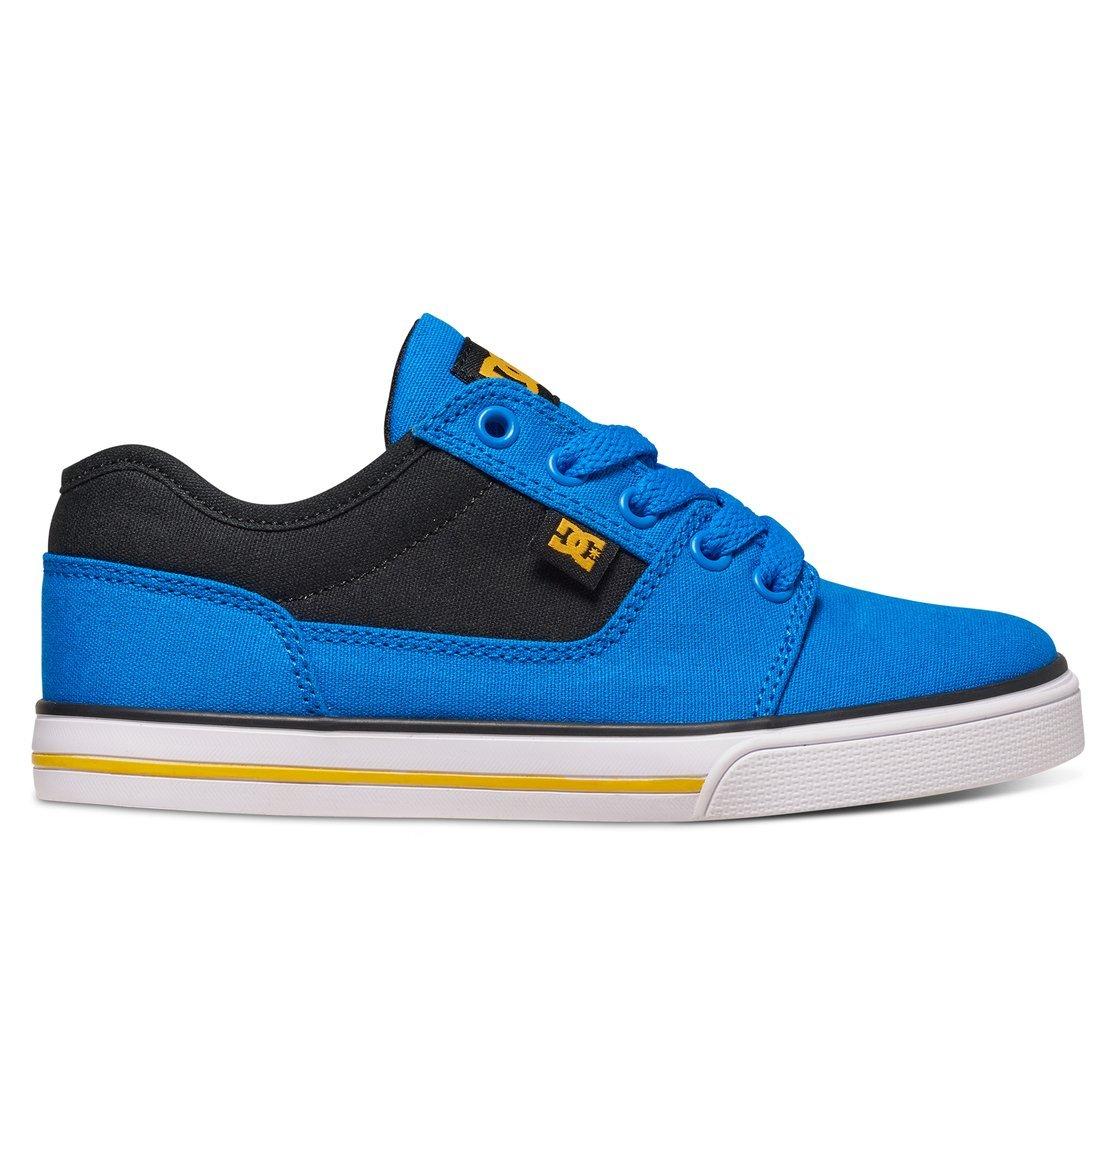 DC Shoes Tonik Tx B, Sneakers garçon ADBS300271